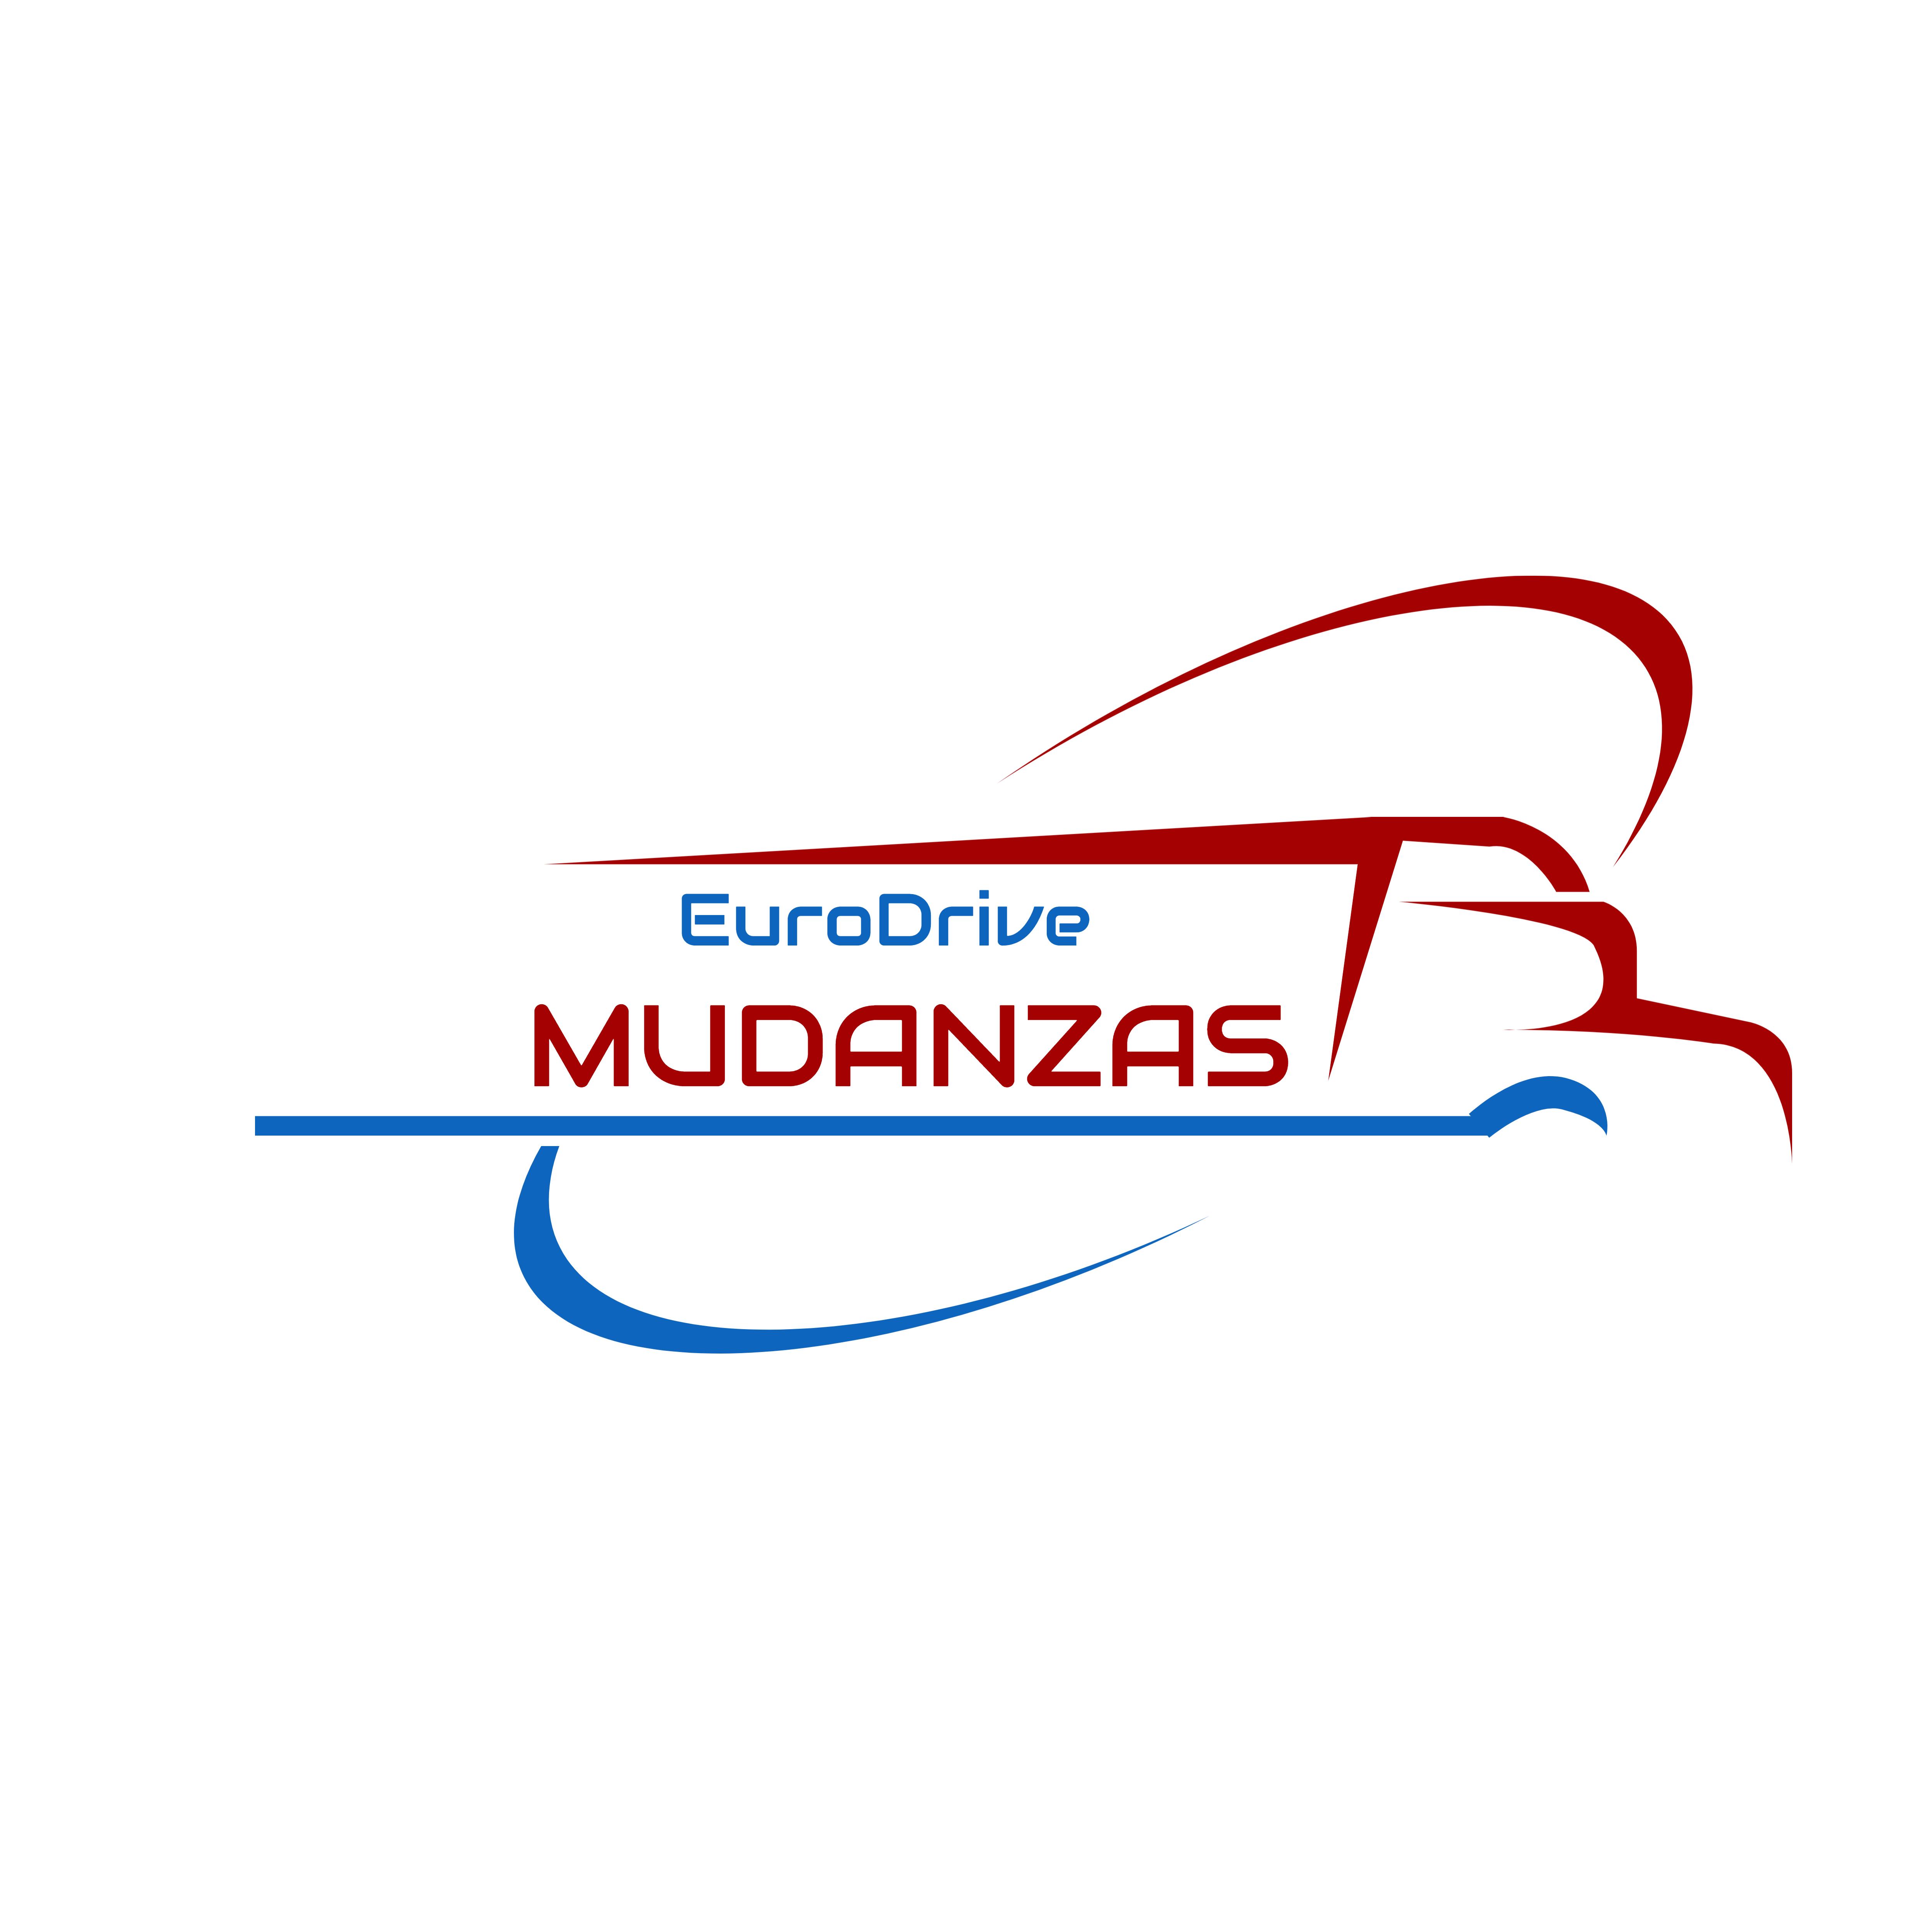 EURODRIVE MUDANZAS